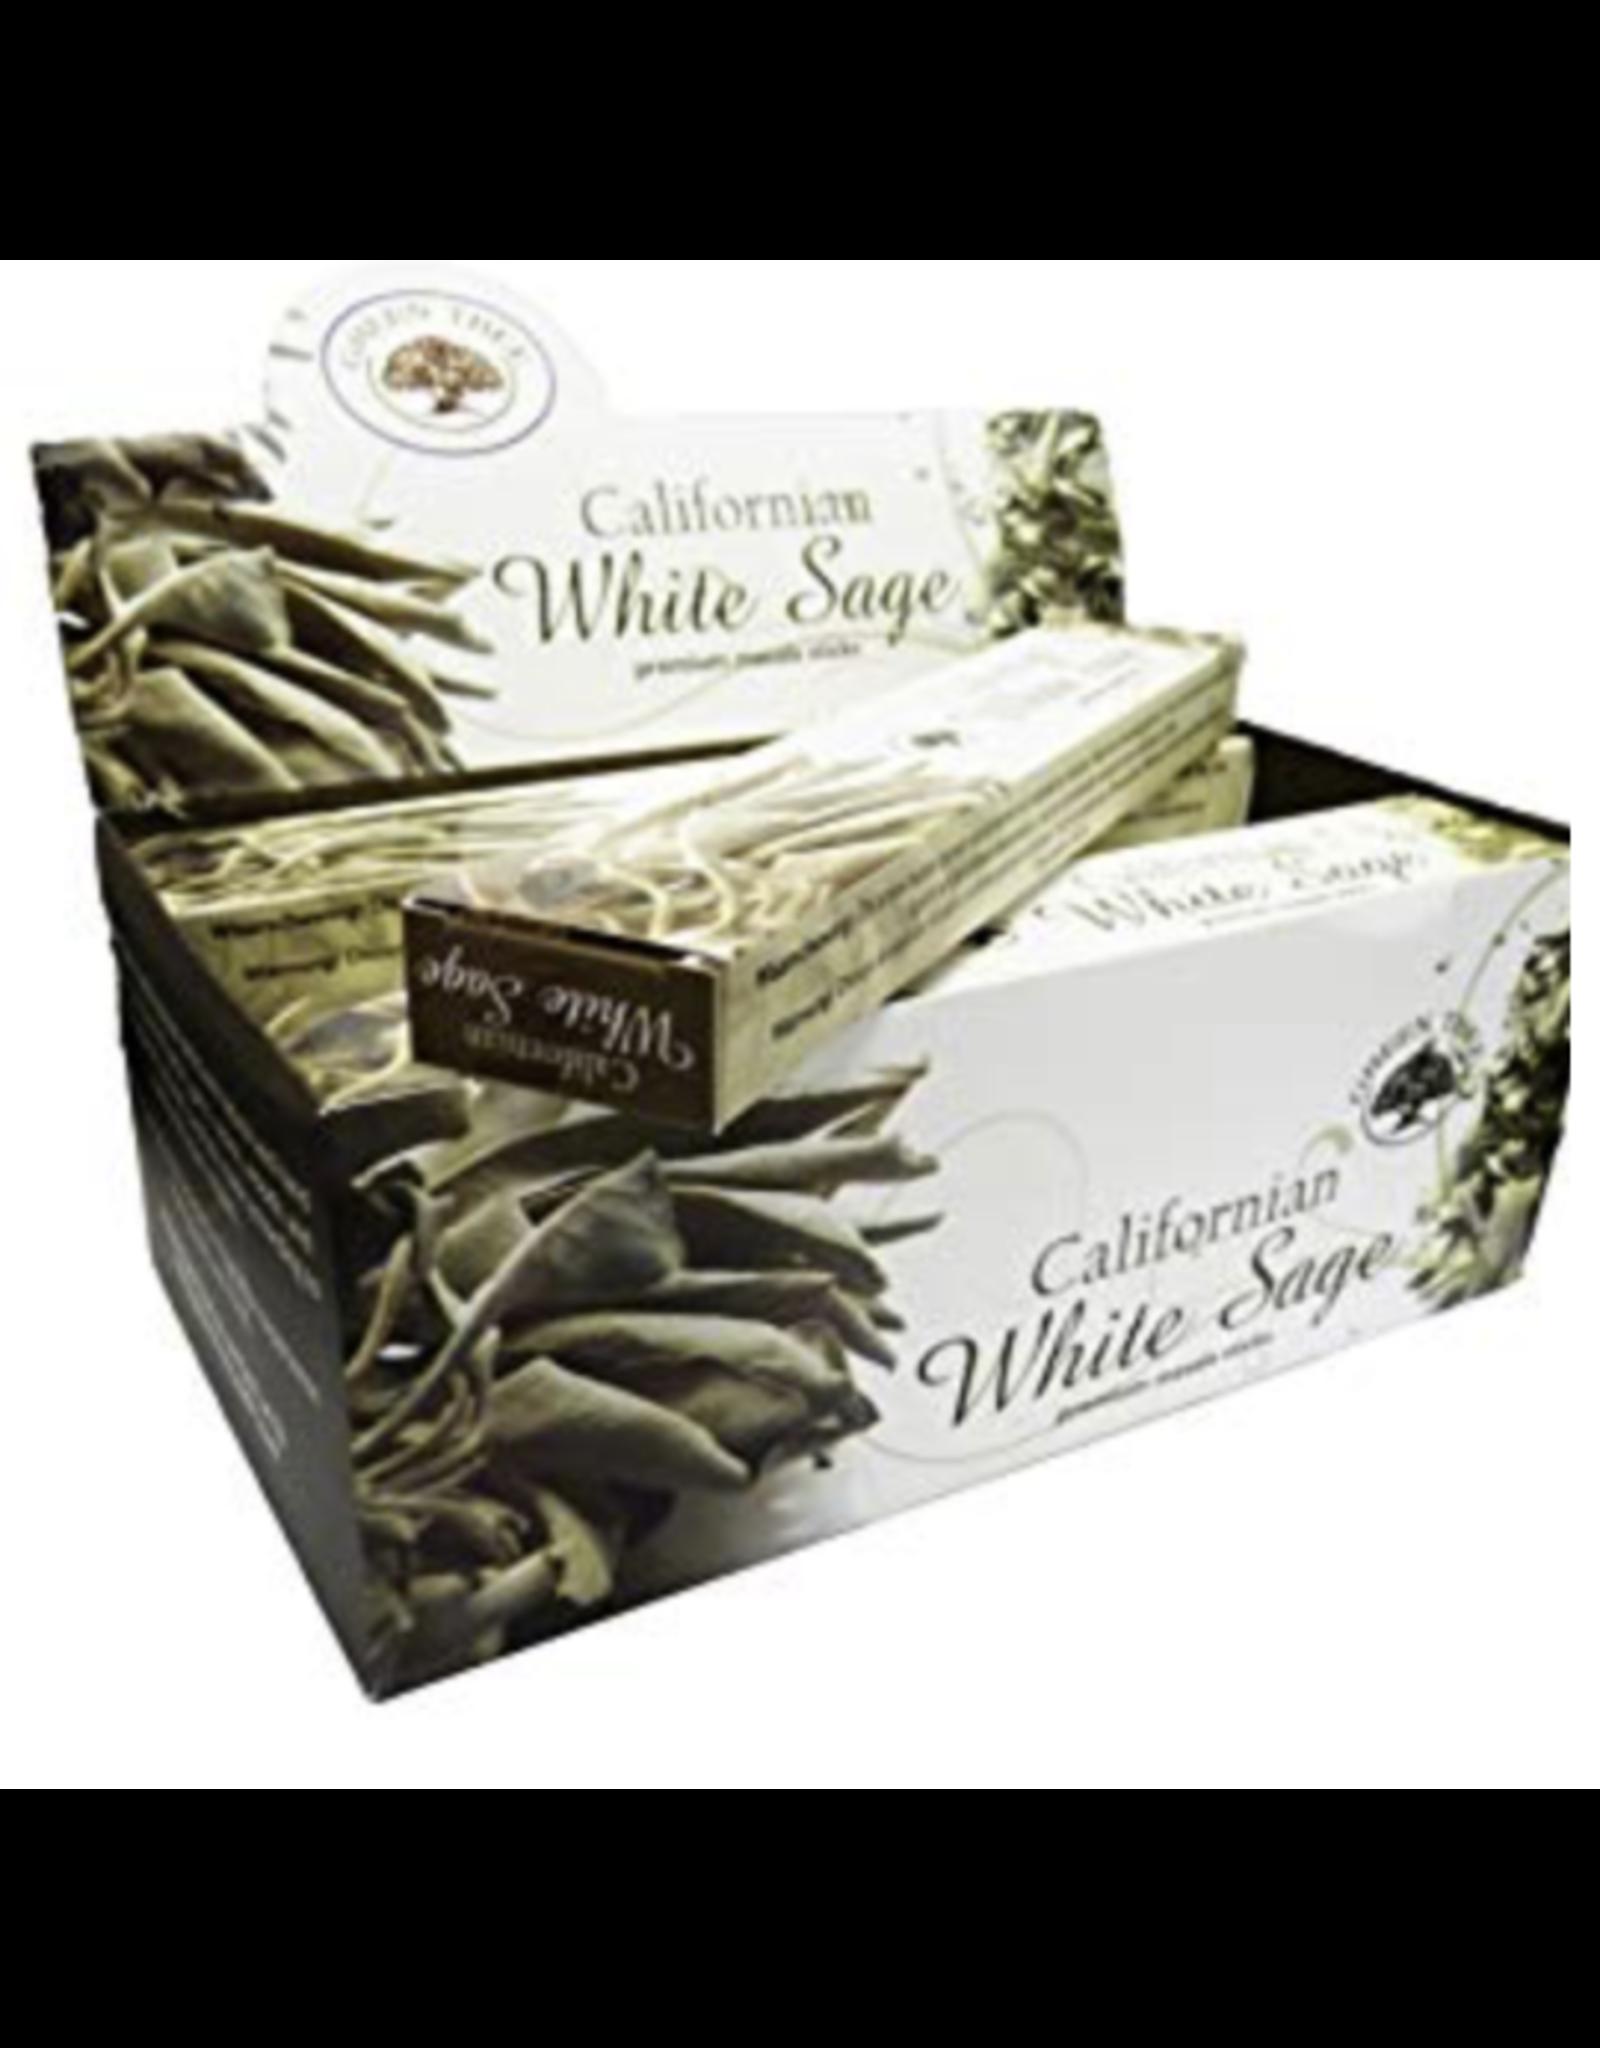 California White Sage Sticks